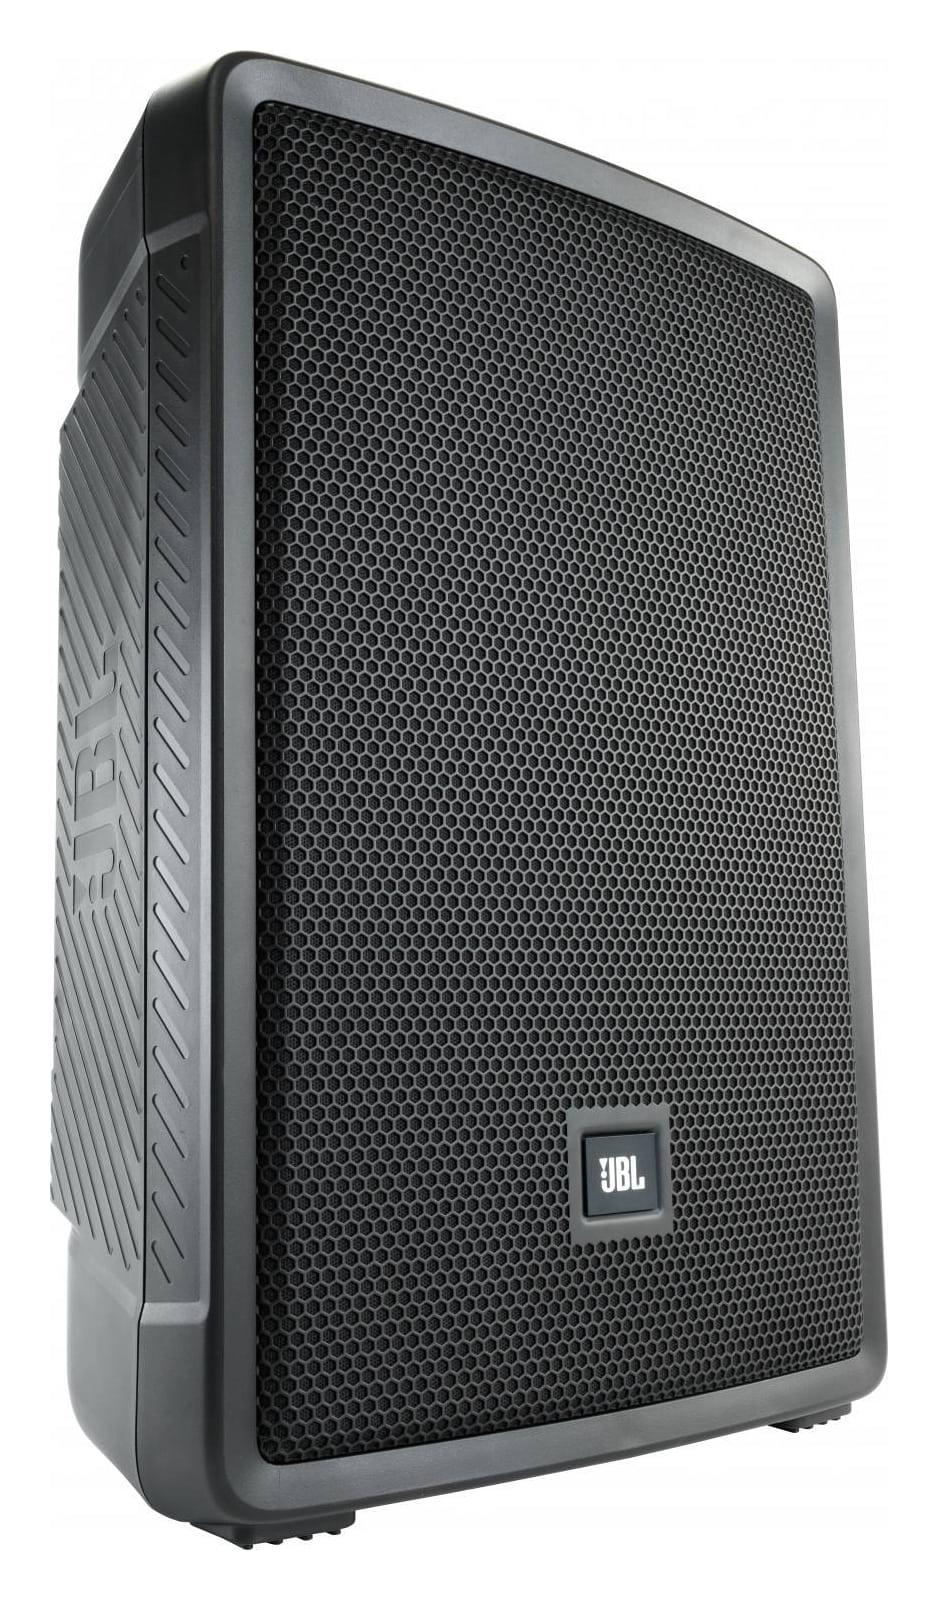 Paendstufen - JBL IRX 112 BT Retoure (Zustand gut) - Onlineshop Musikhaus Kirstein